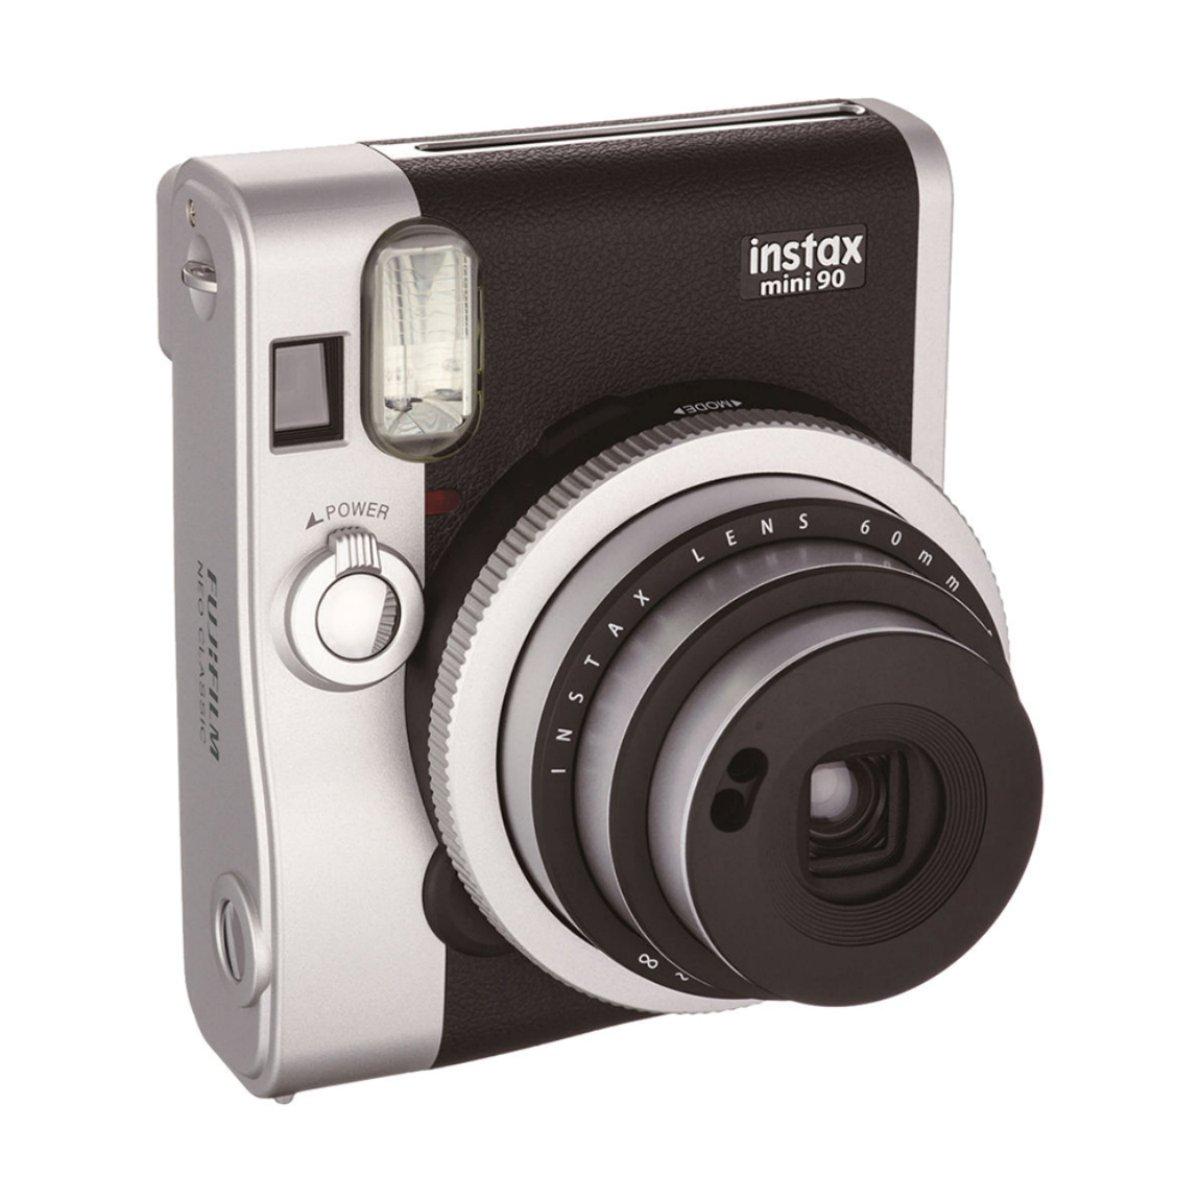 fujifilm instax mini 90 camera. Black Bedroom Furniture Sets. Home Design Ideas